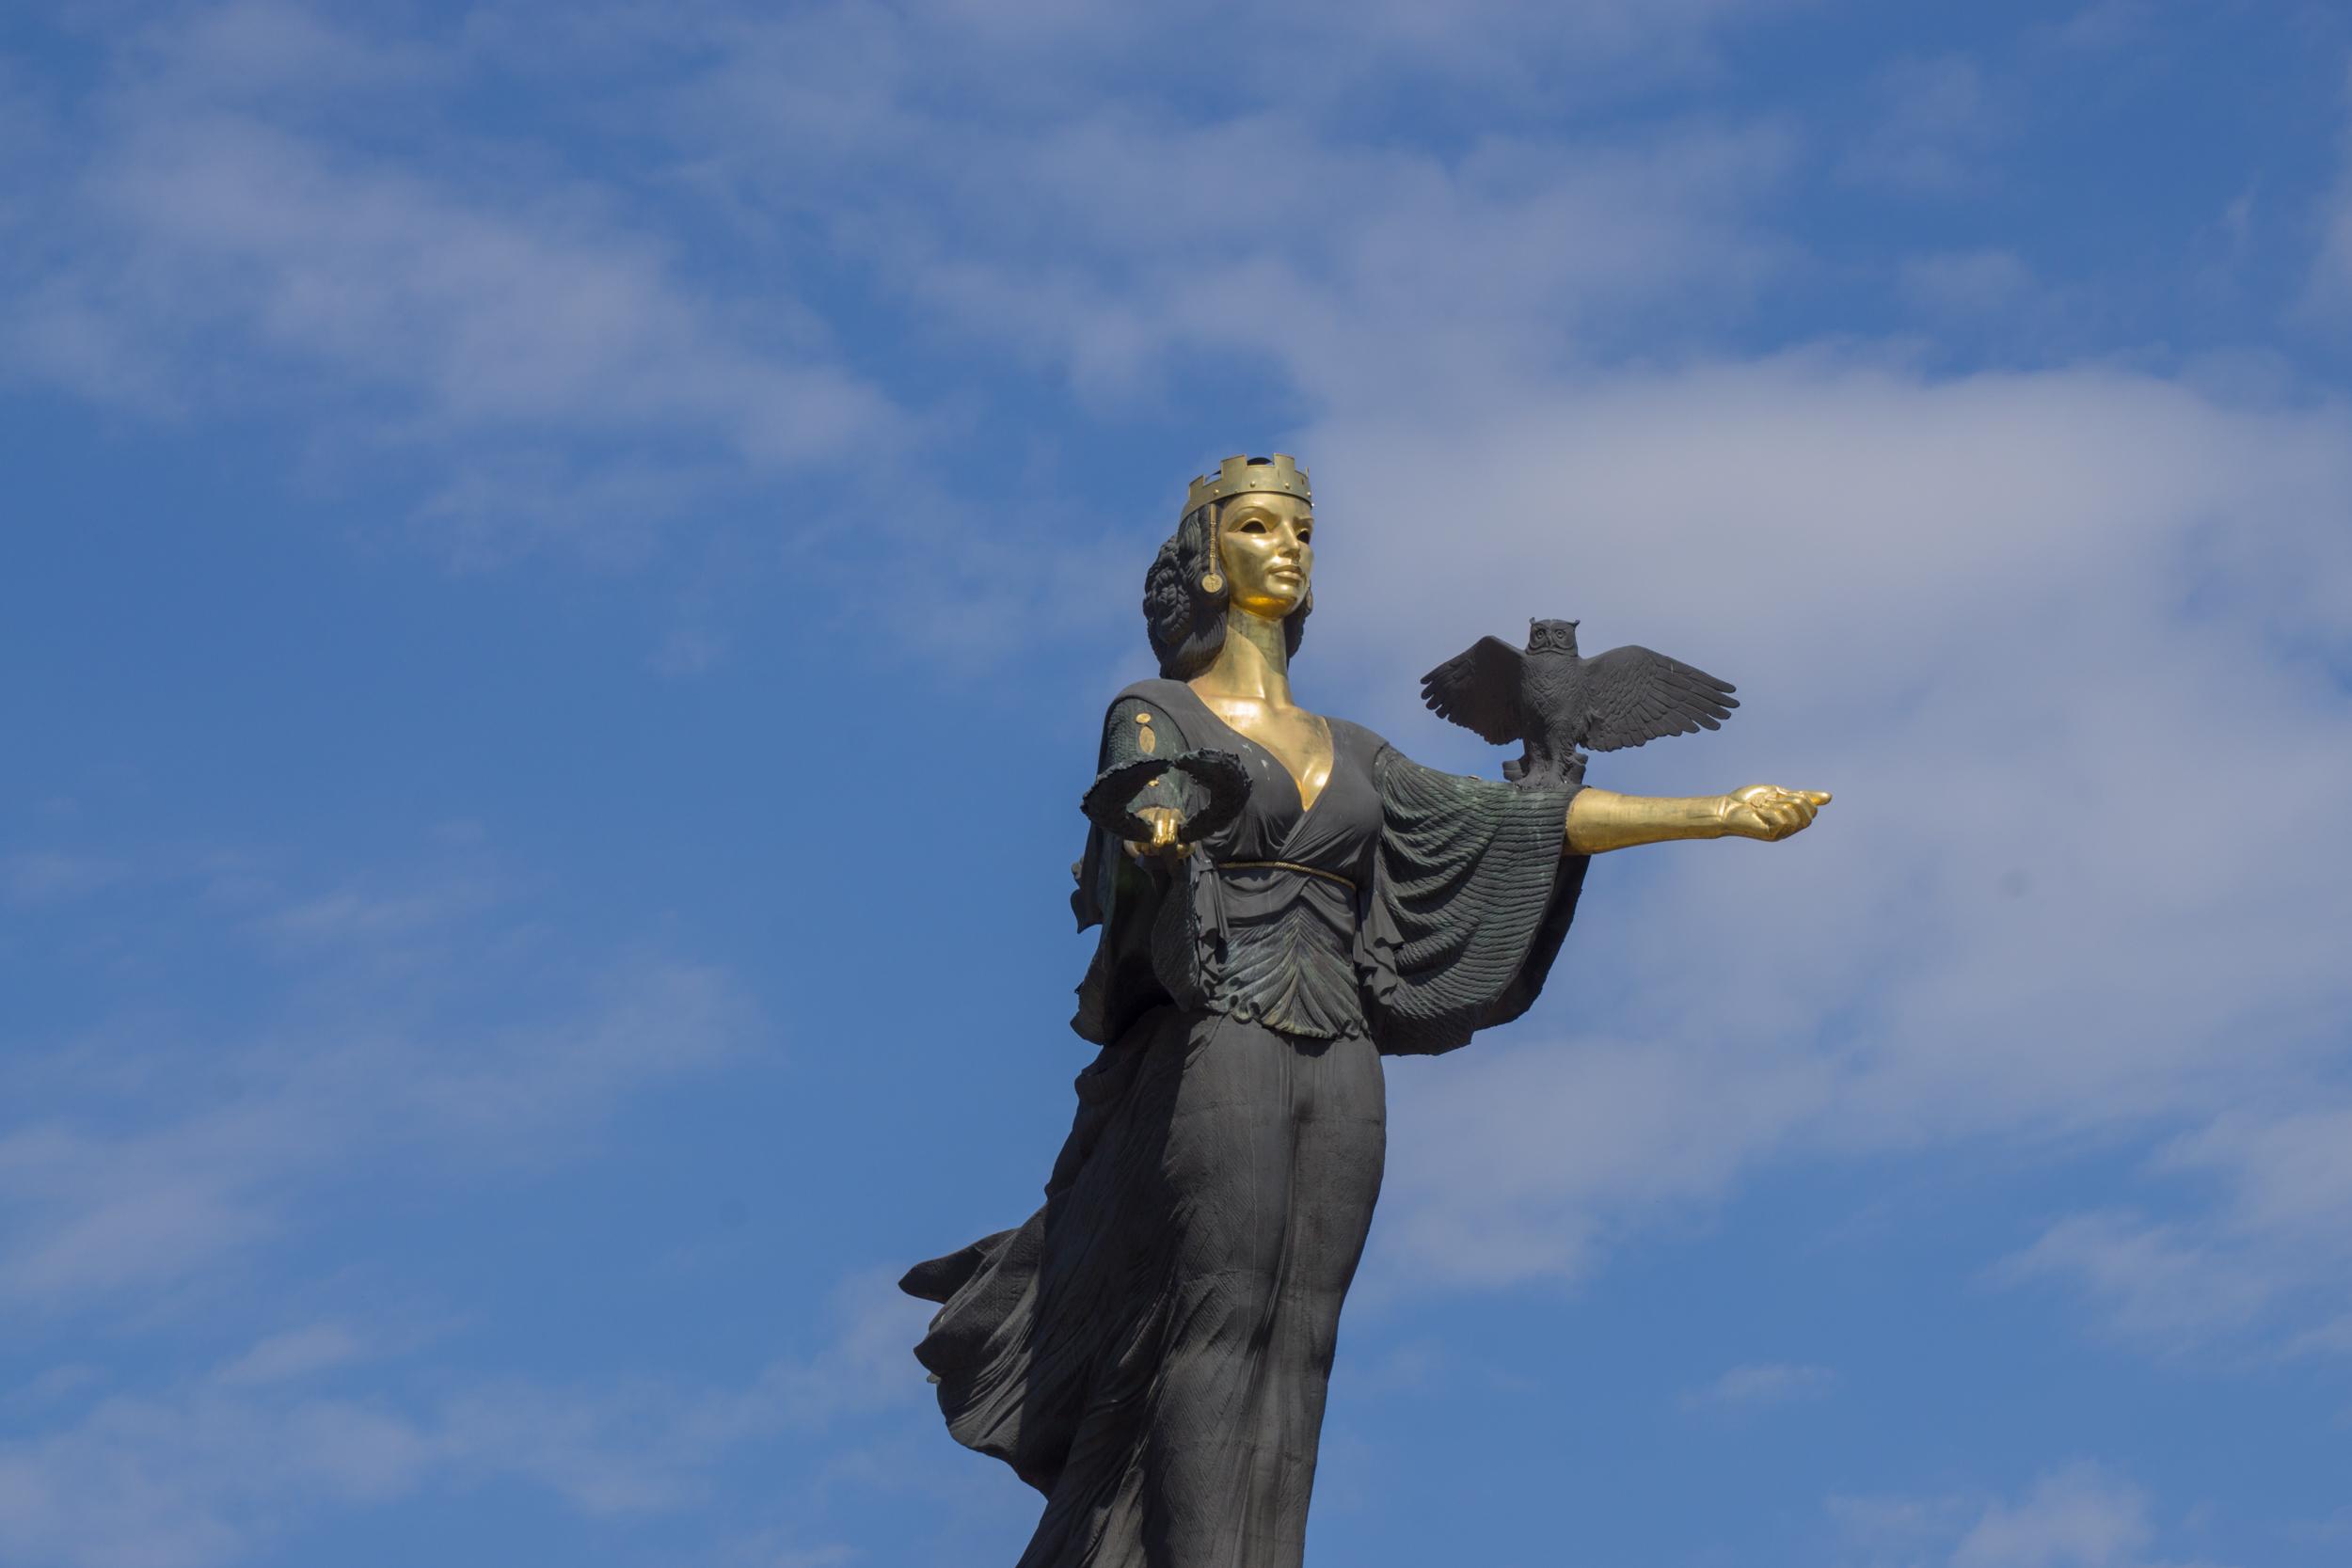 Bulgaria: Statue of Sveta Sofia